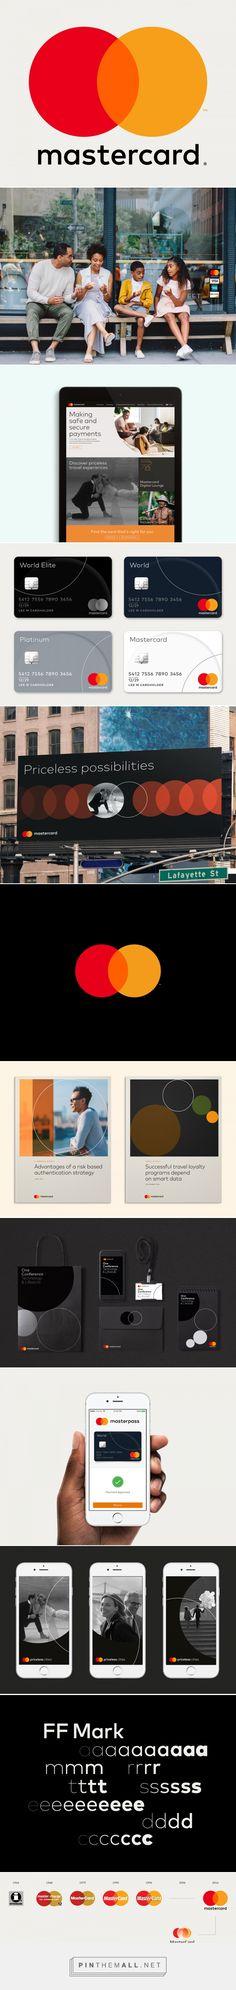 banking art New Logo and Identity for Mas - banking Corporate Branding, Corporate Design, Logo Branding, Brand Identity Design, Branding Design, Banks Logo, Credit Card Design, Fashion Logo Design, Photography Logo Design